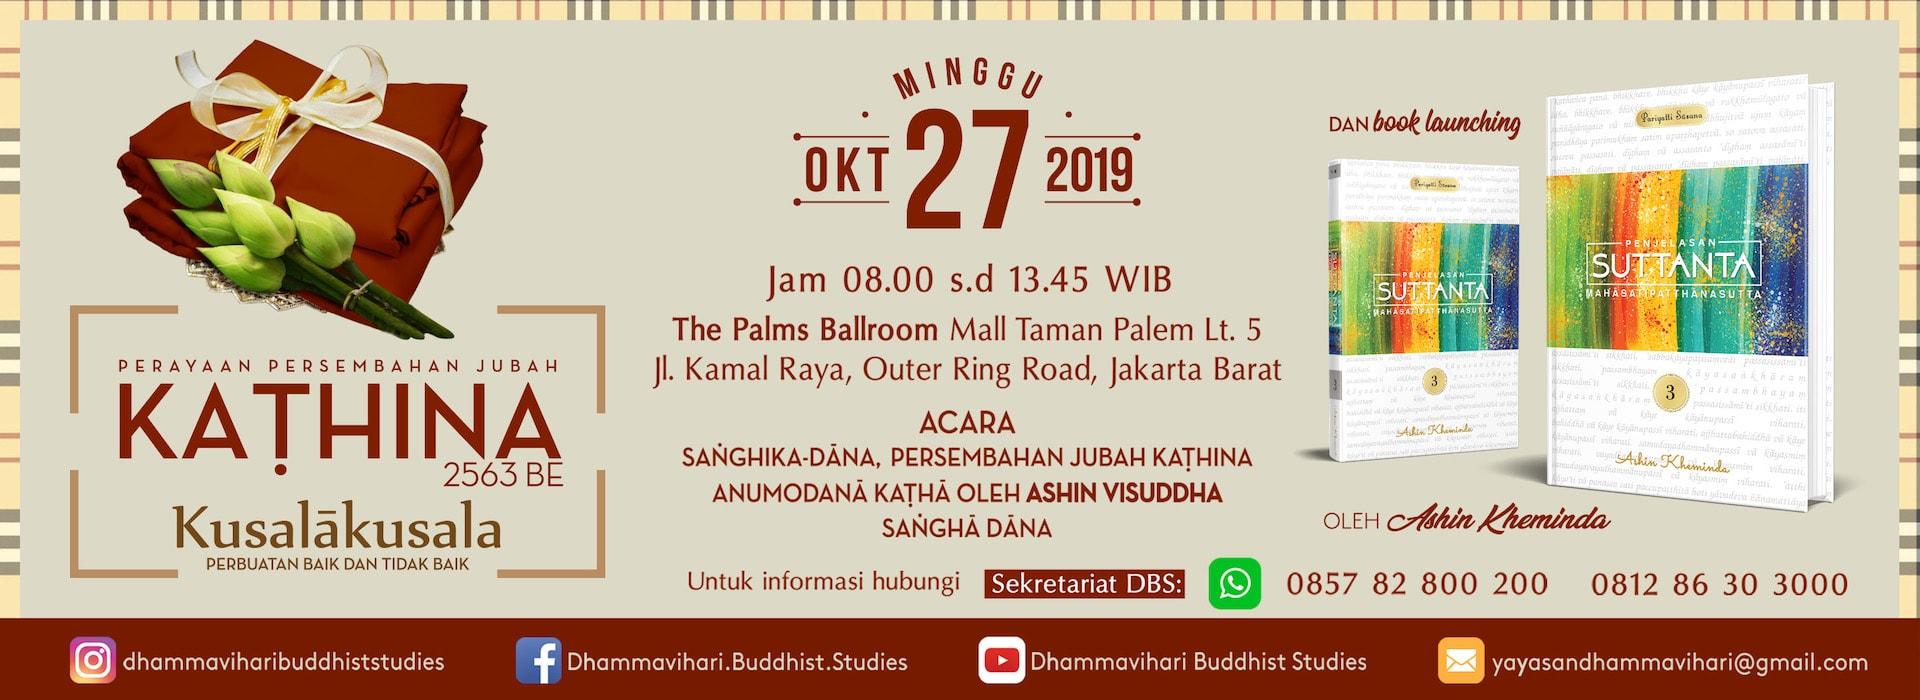 Perayaan Kaṭhina 2019